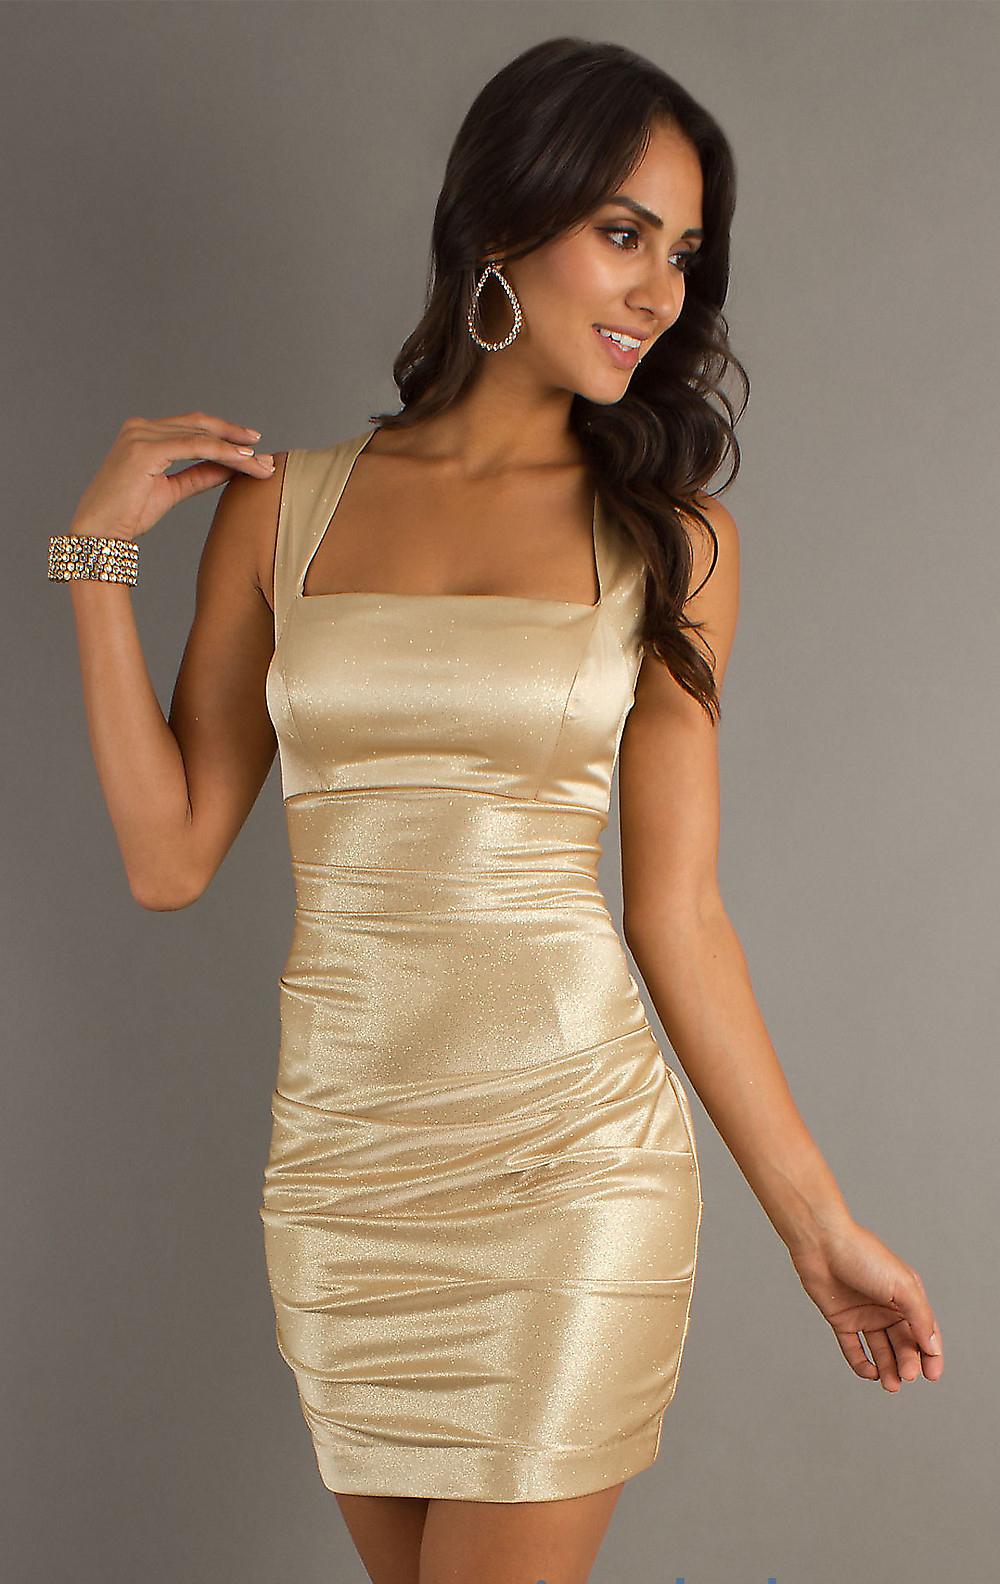 fustane per mbremje te matures 2014 - YouTube